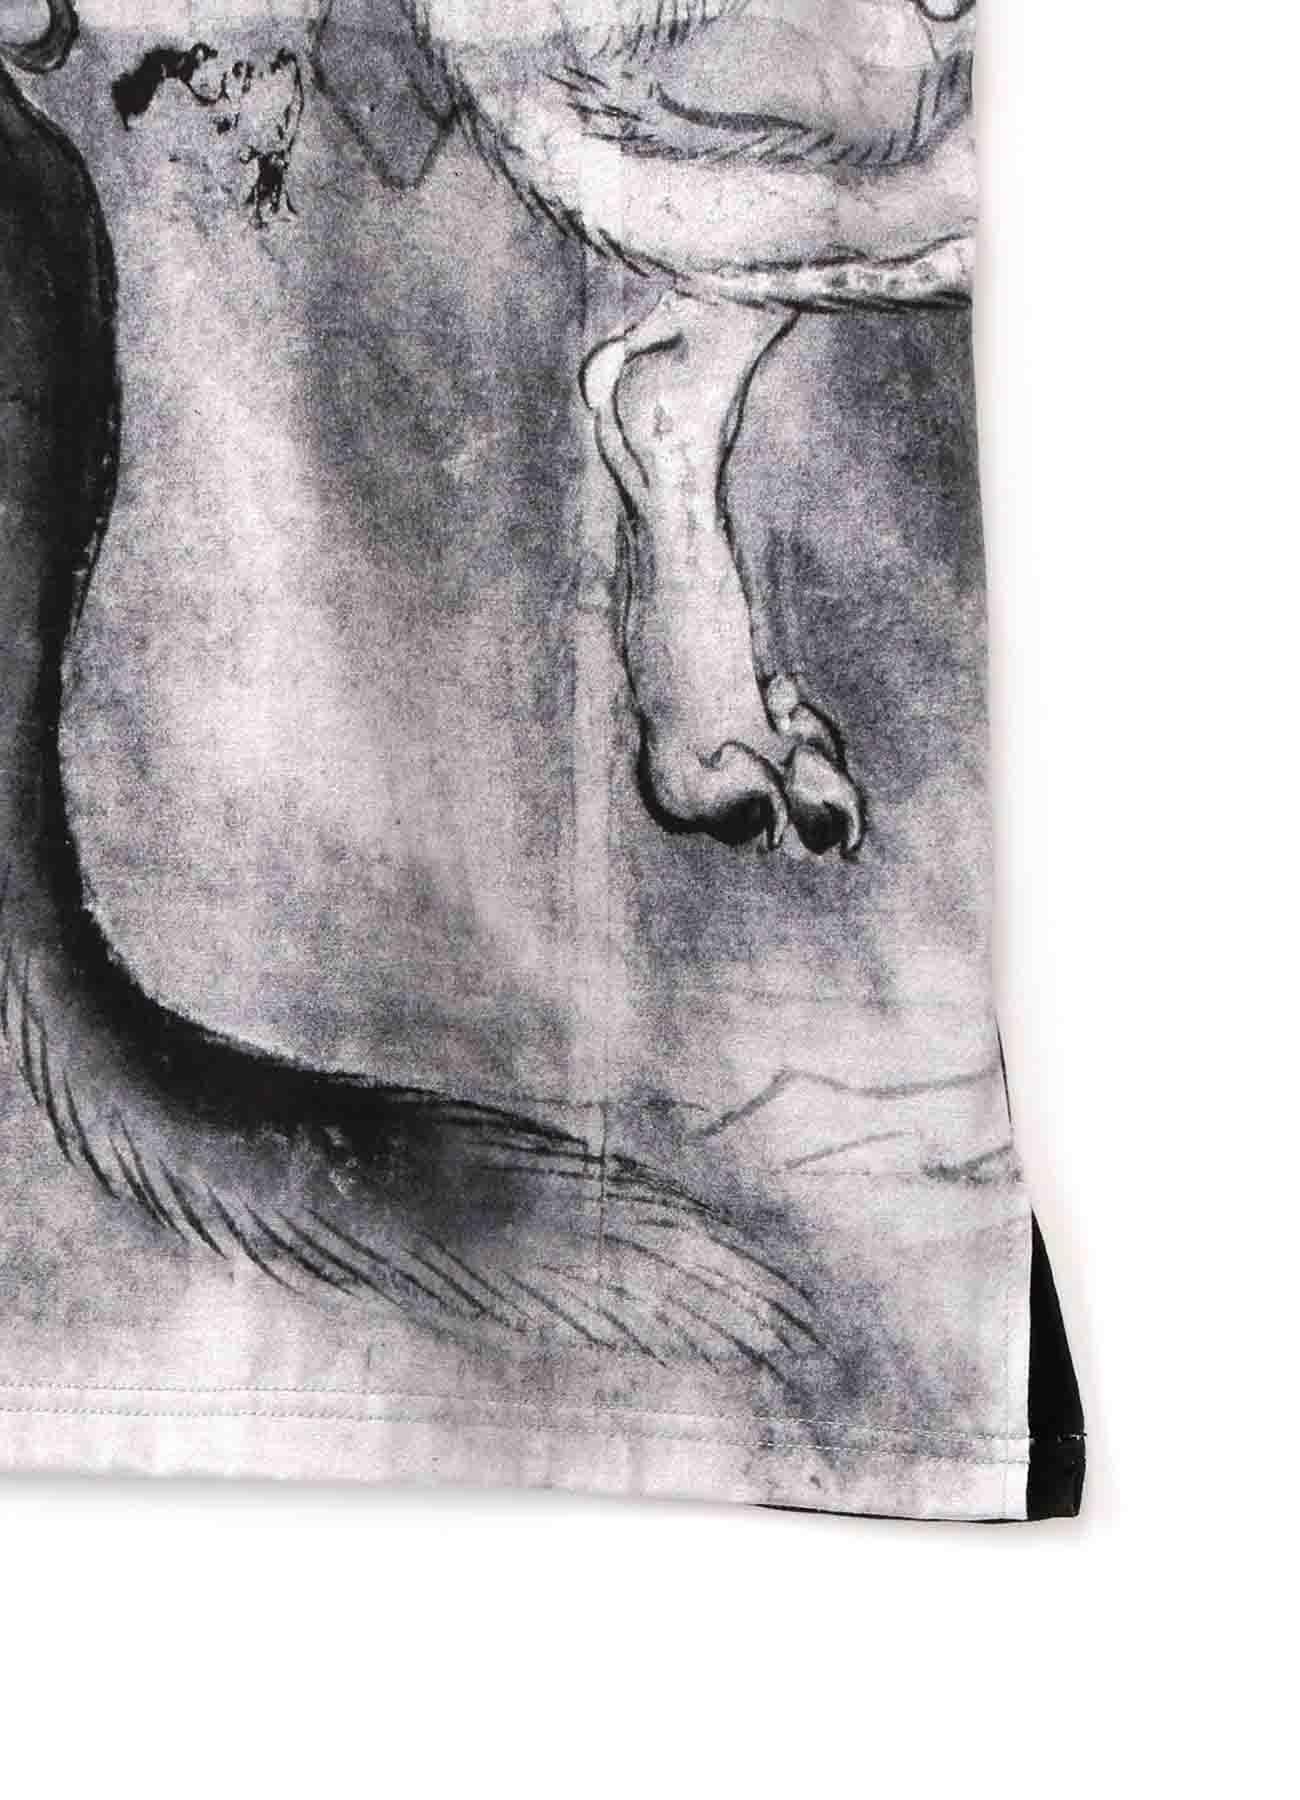 河鍋暁斎「鳥獣戯画 梟と狸の祭礼行列」 Big Cut Sew